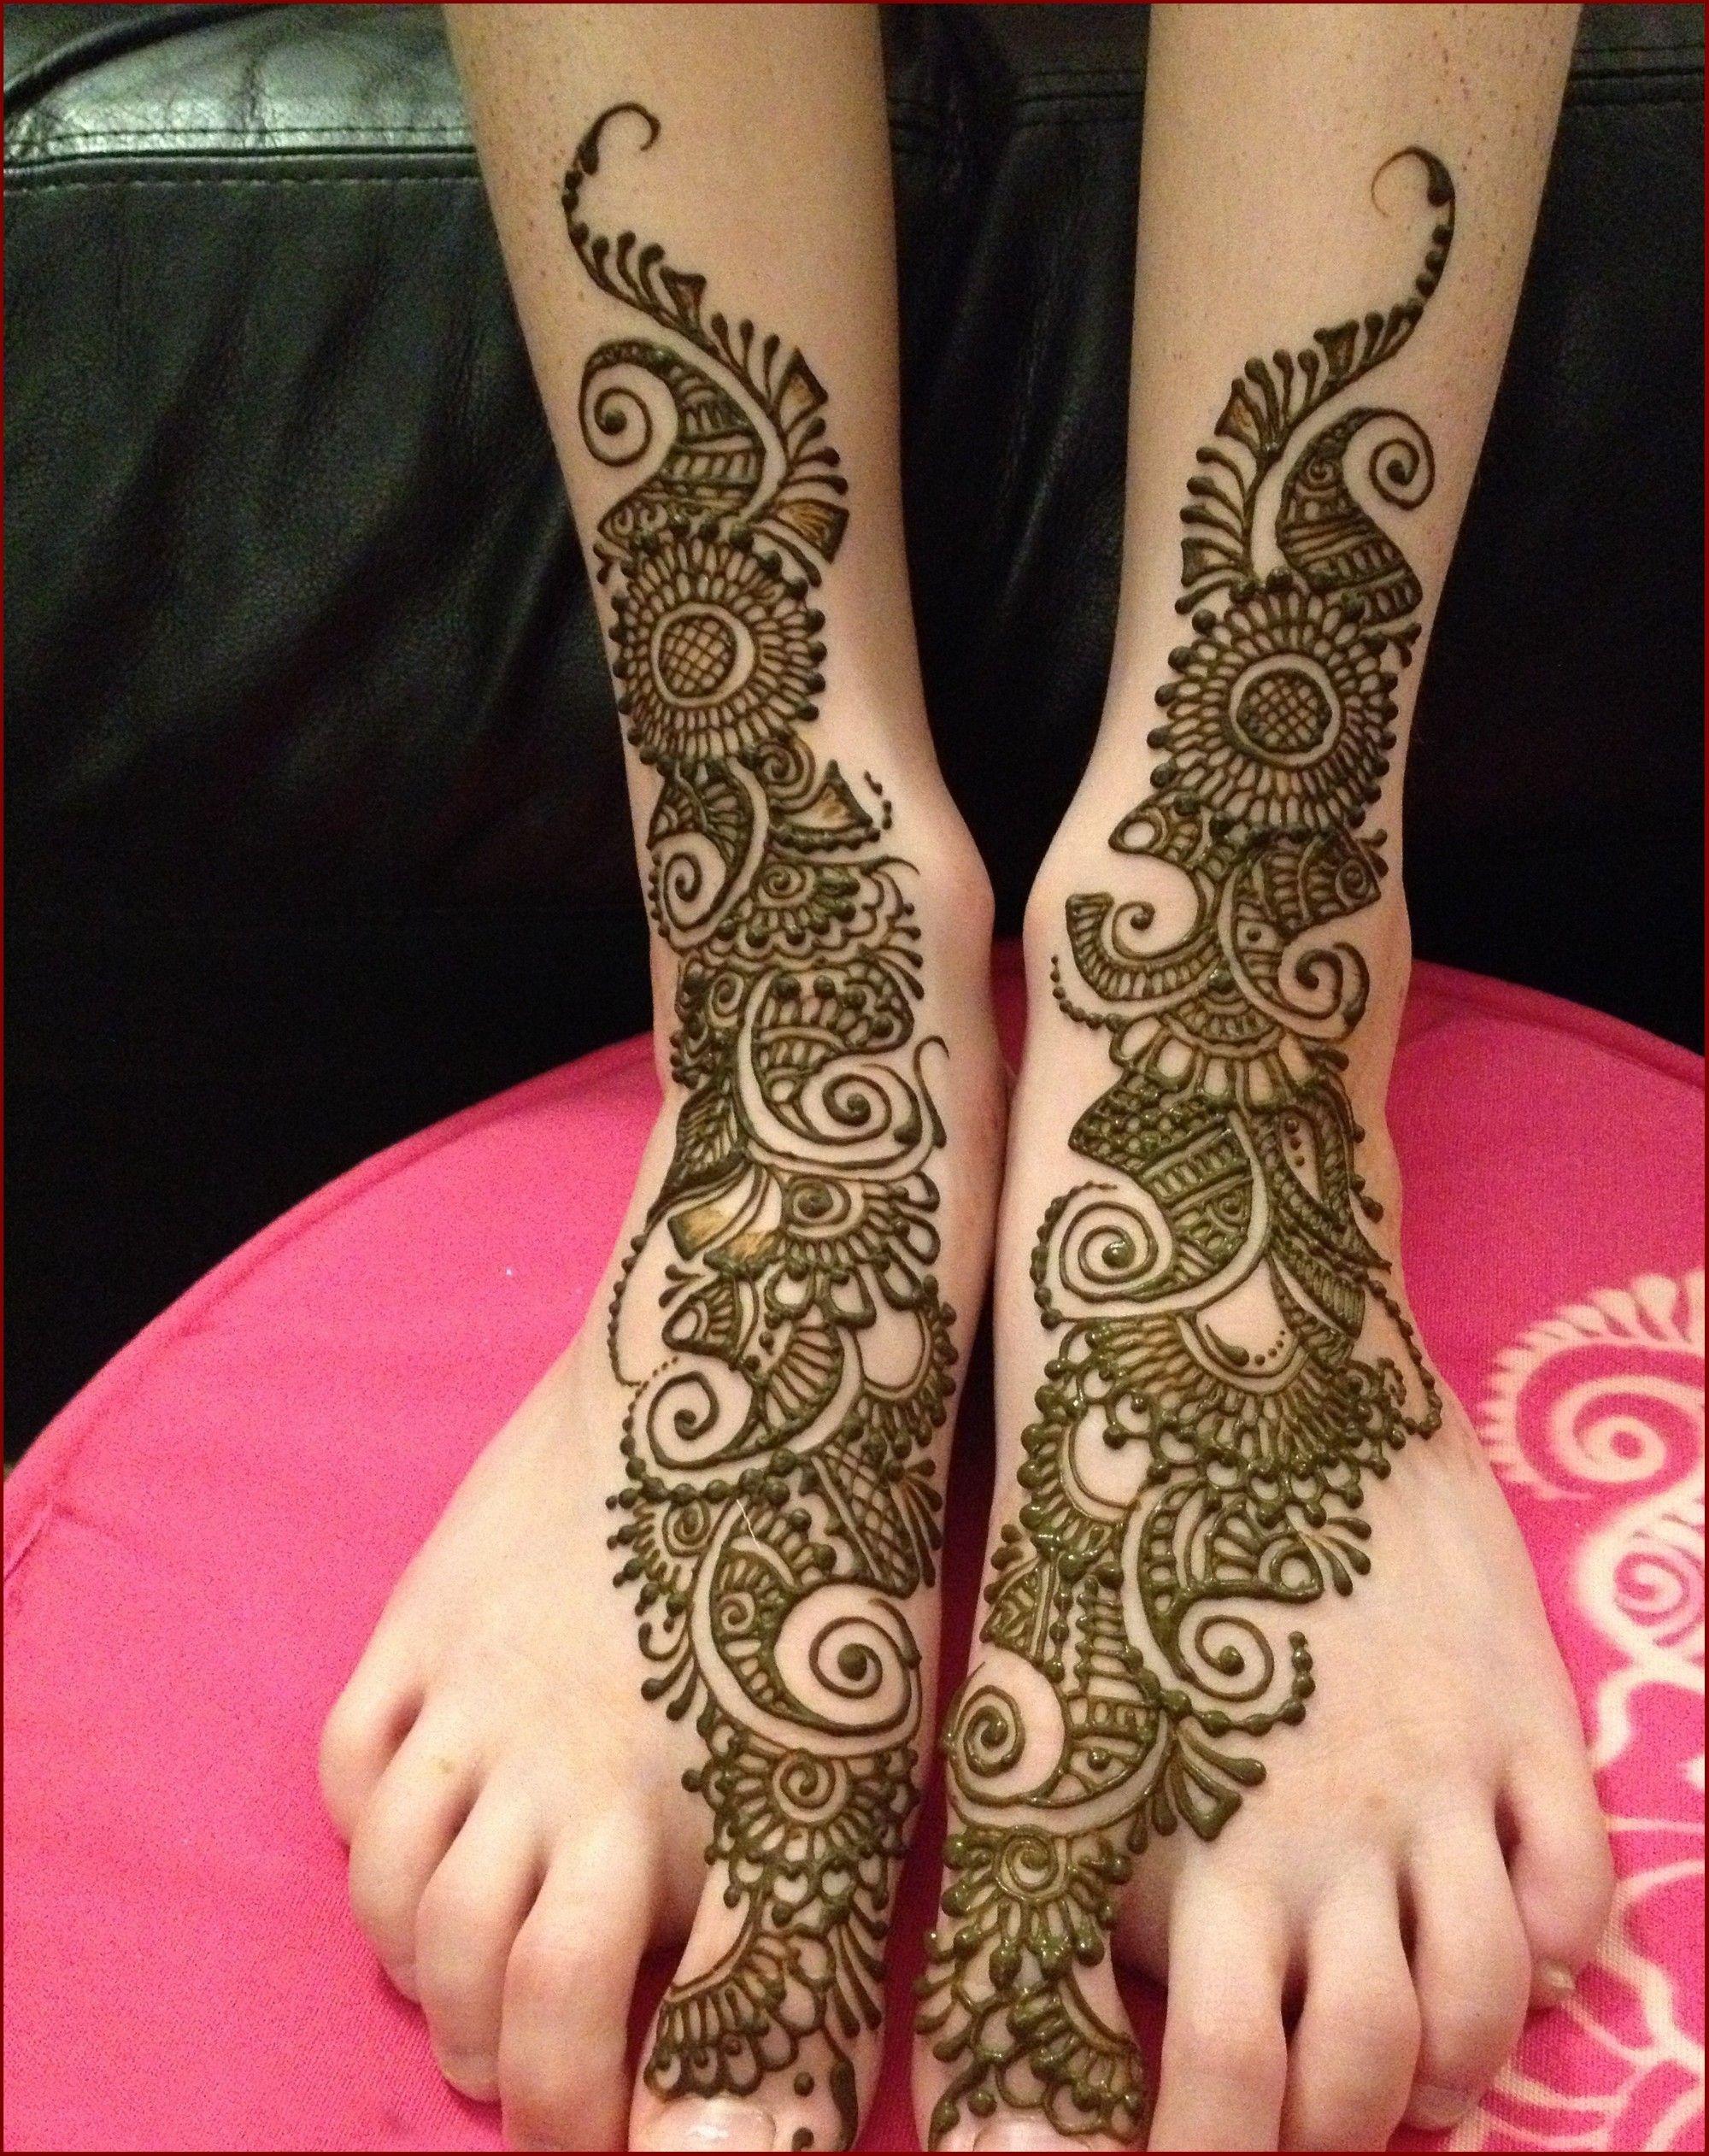 Arabic Mehndi Designs For Feet Mehndi Mehndidesigns Arabicmehndi